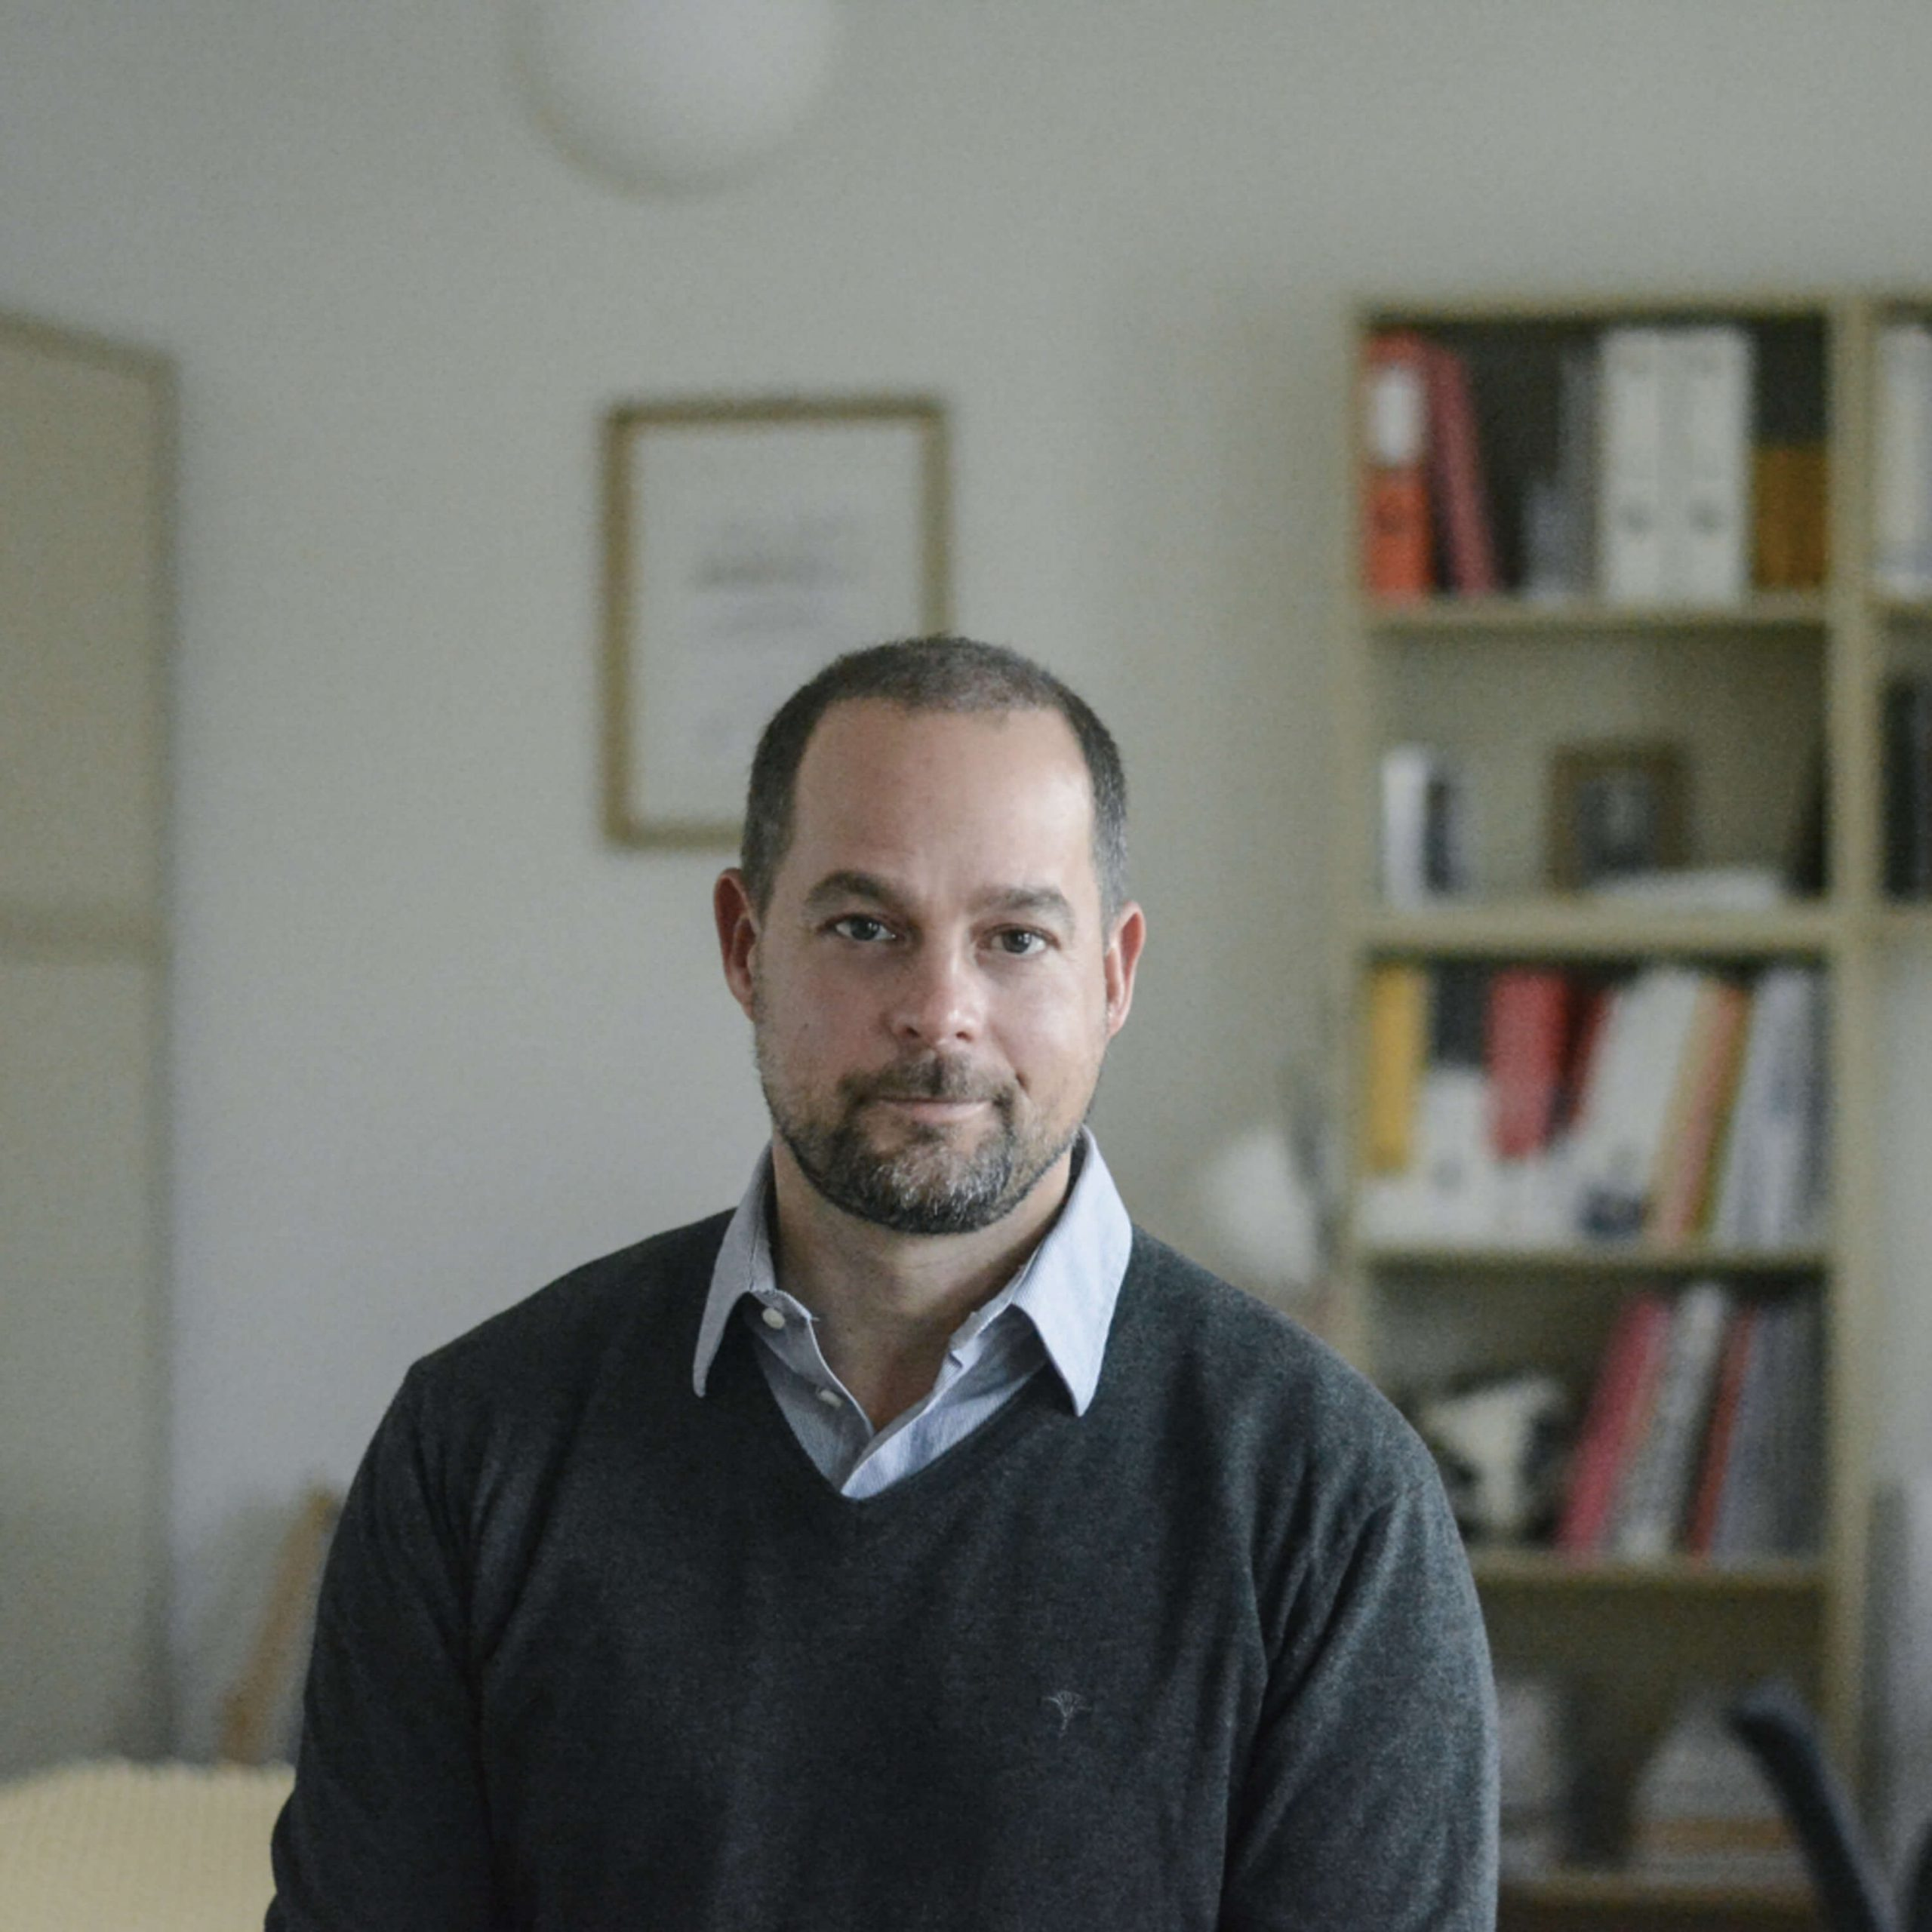 Bernd Albel